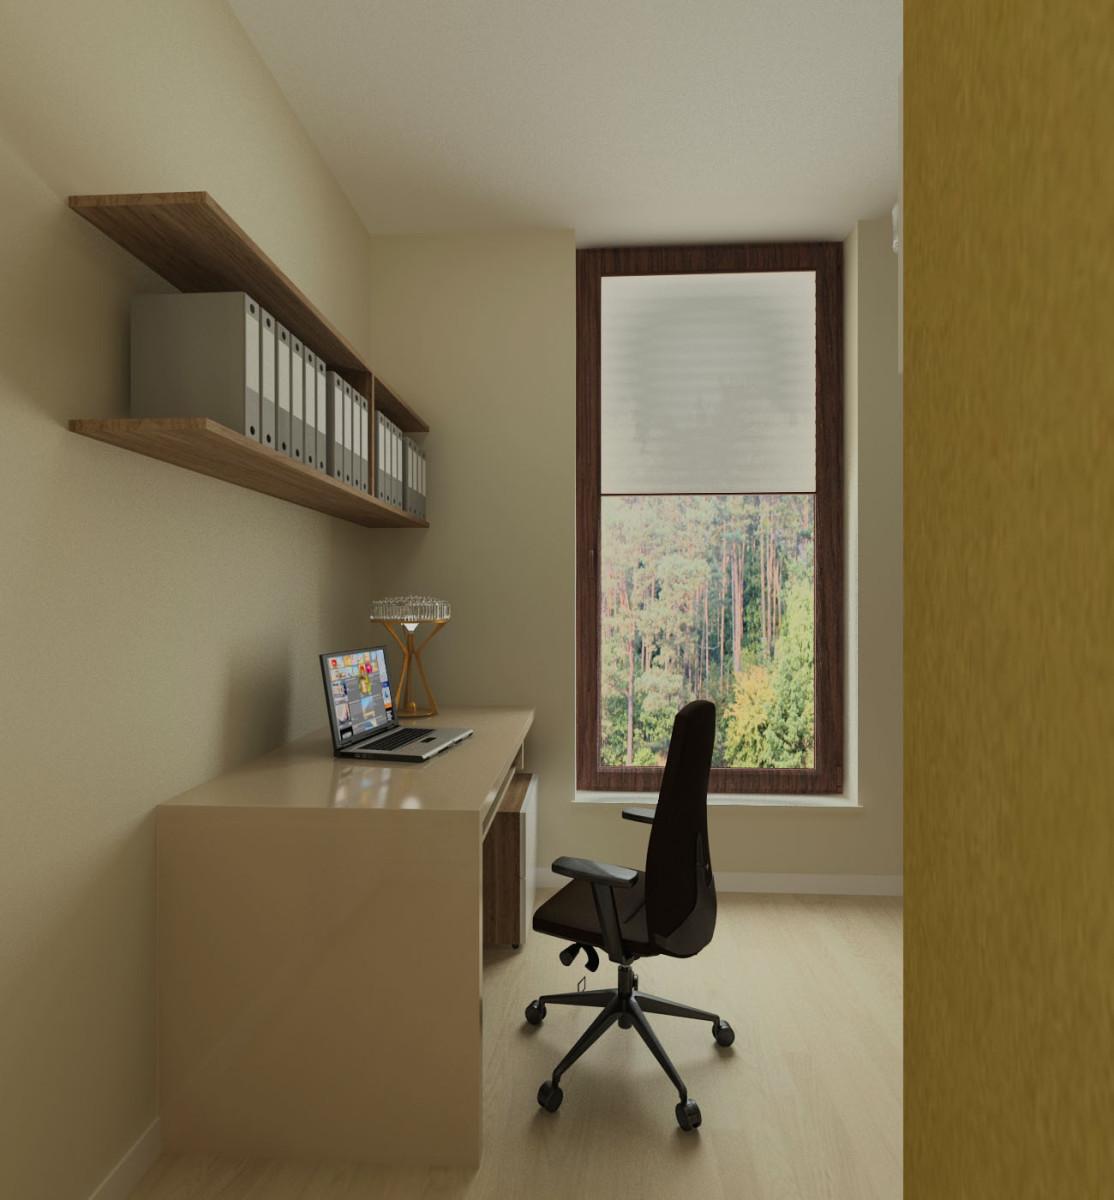 gabinet w mieszkaniu (4)